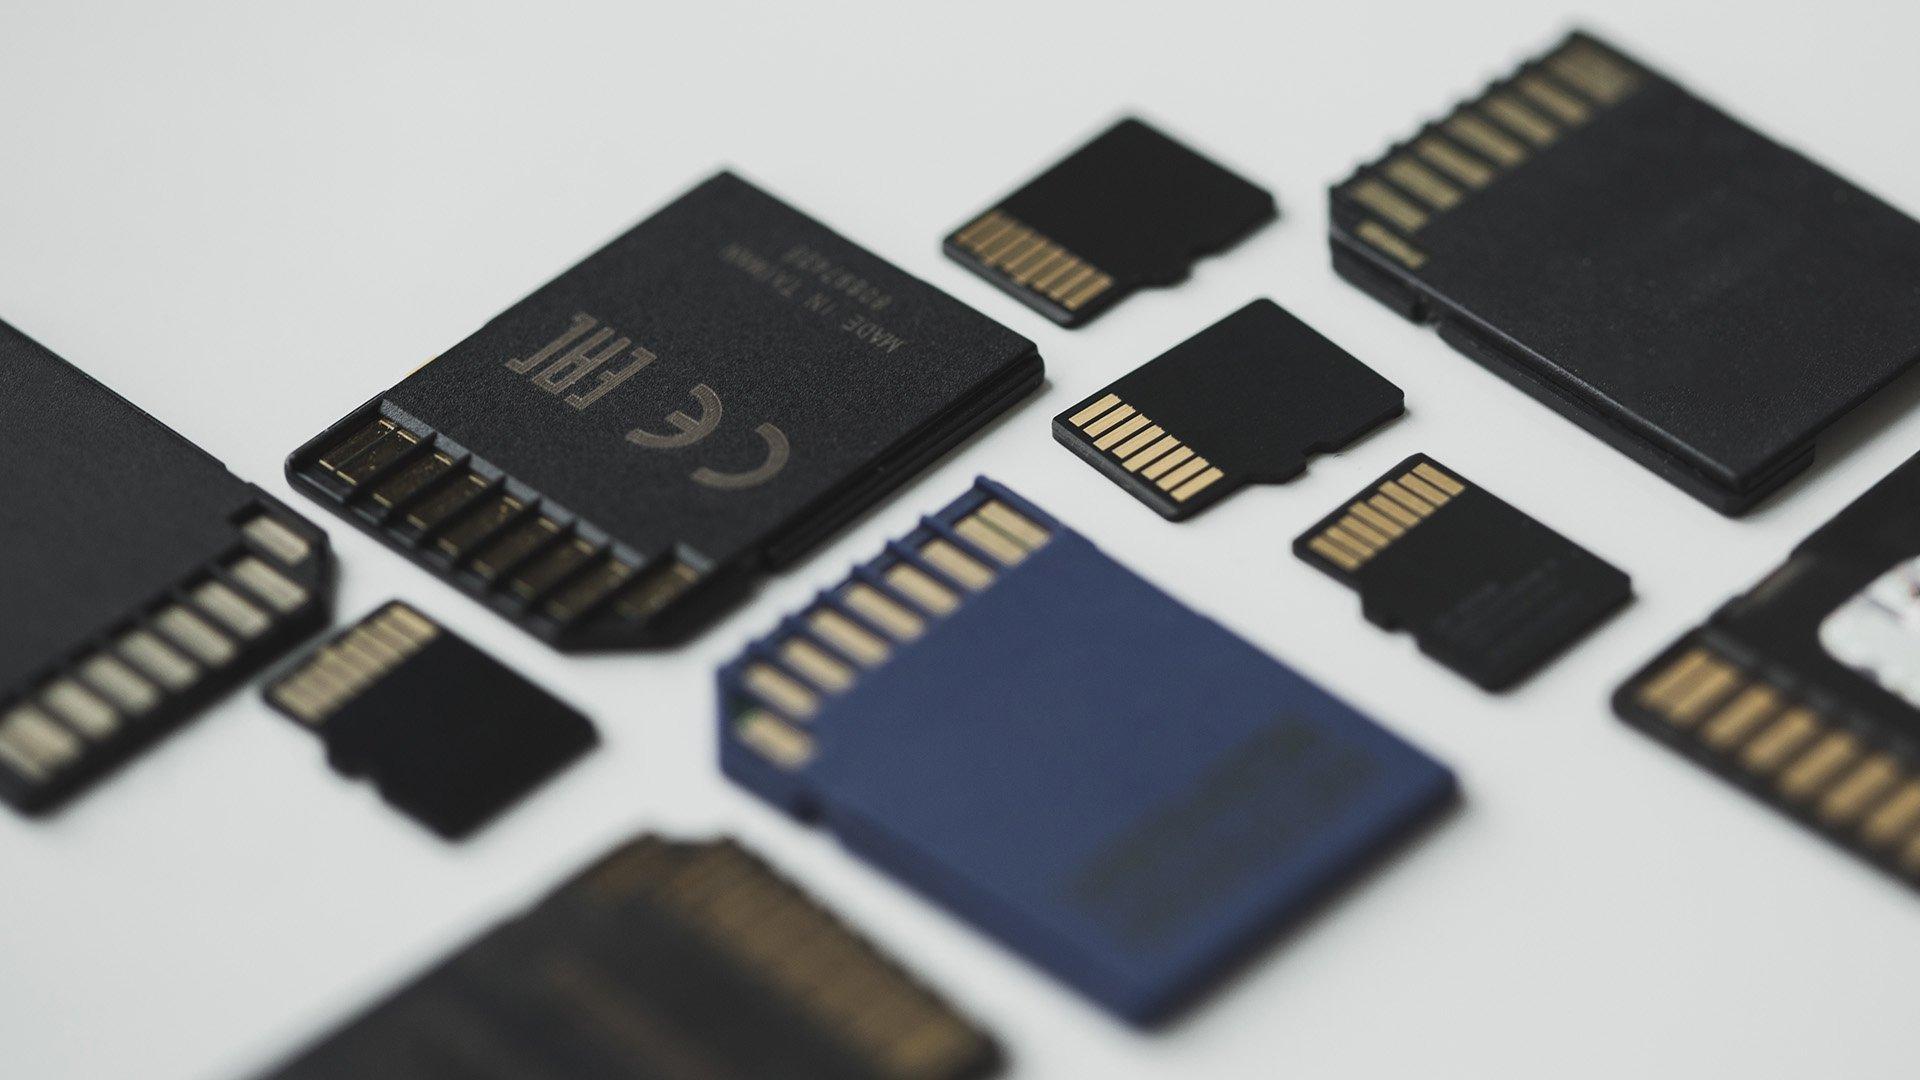 Qué tarjeta micro SD comprar? | AndroidPIT